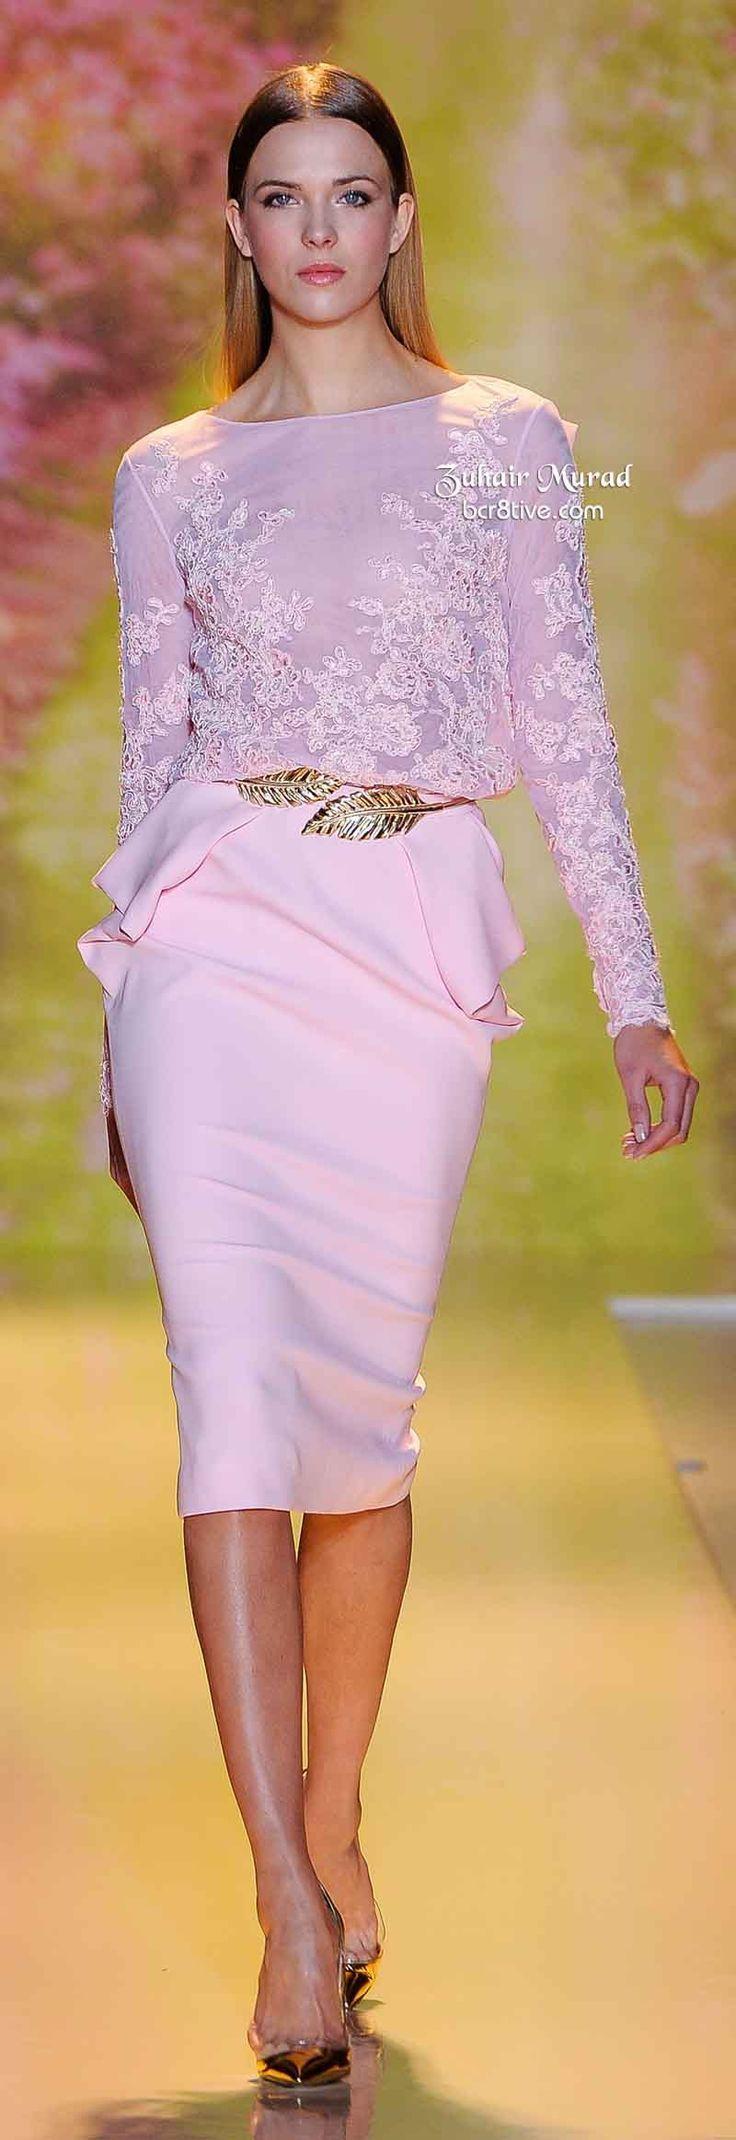 Zuhair murad spring haute couture love the gold belt makes